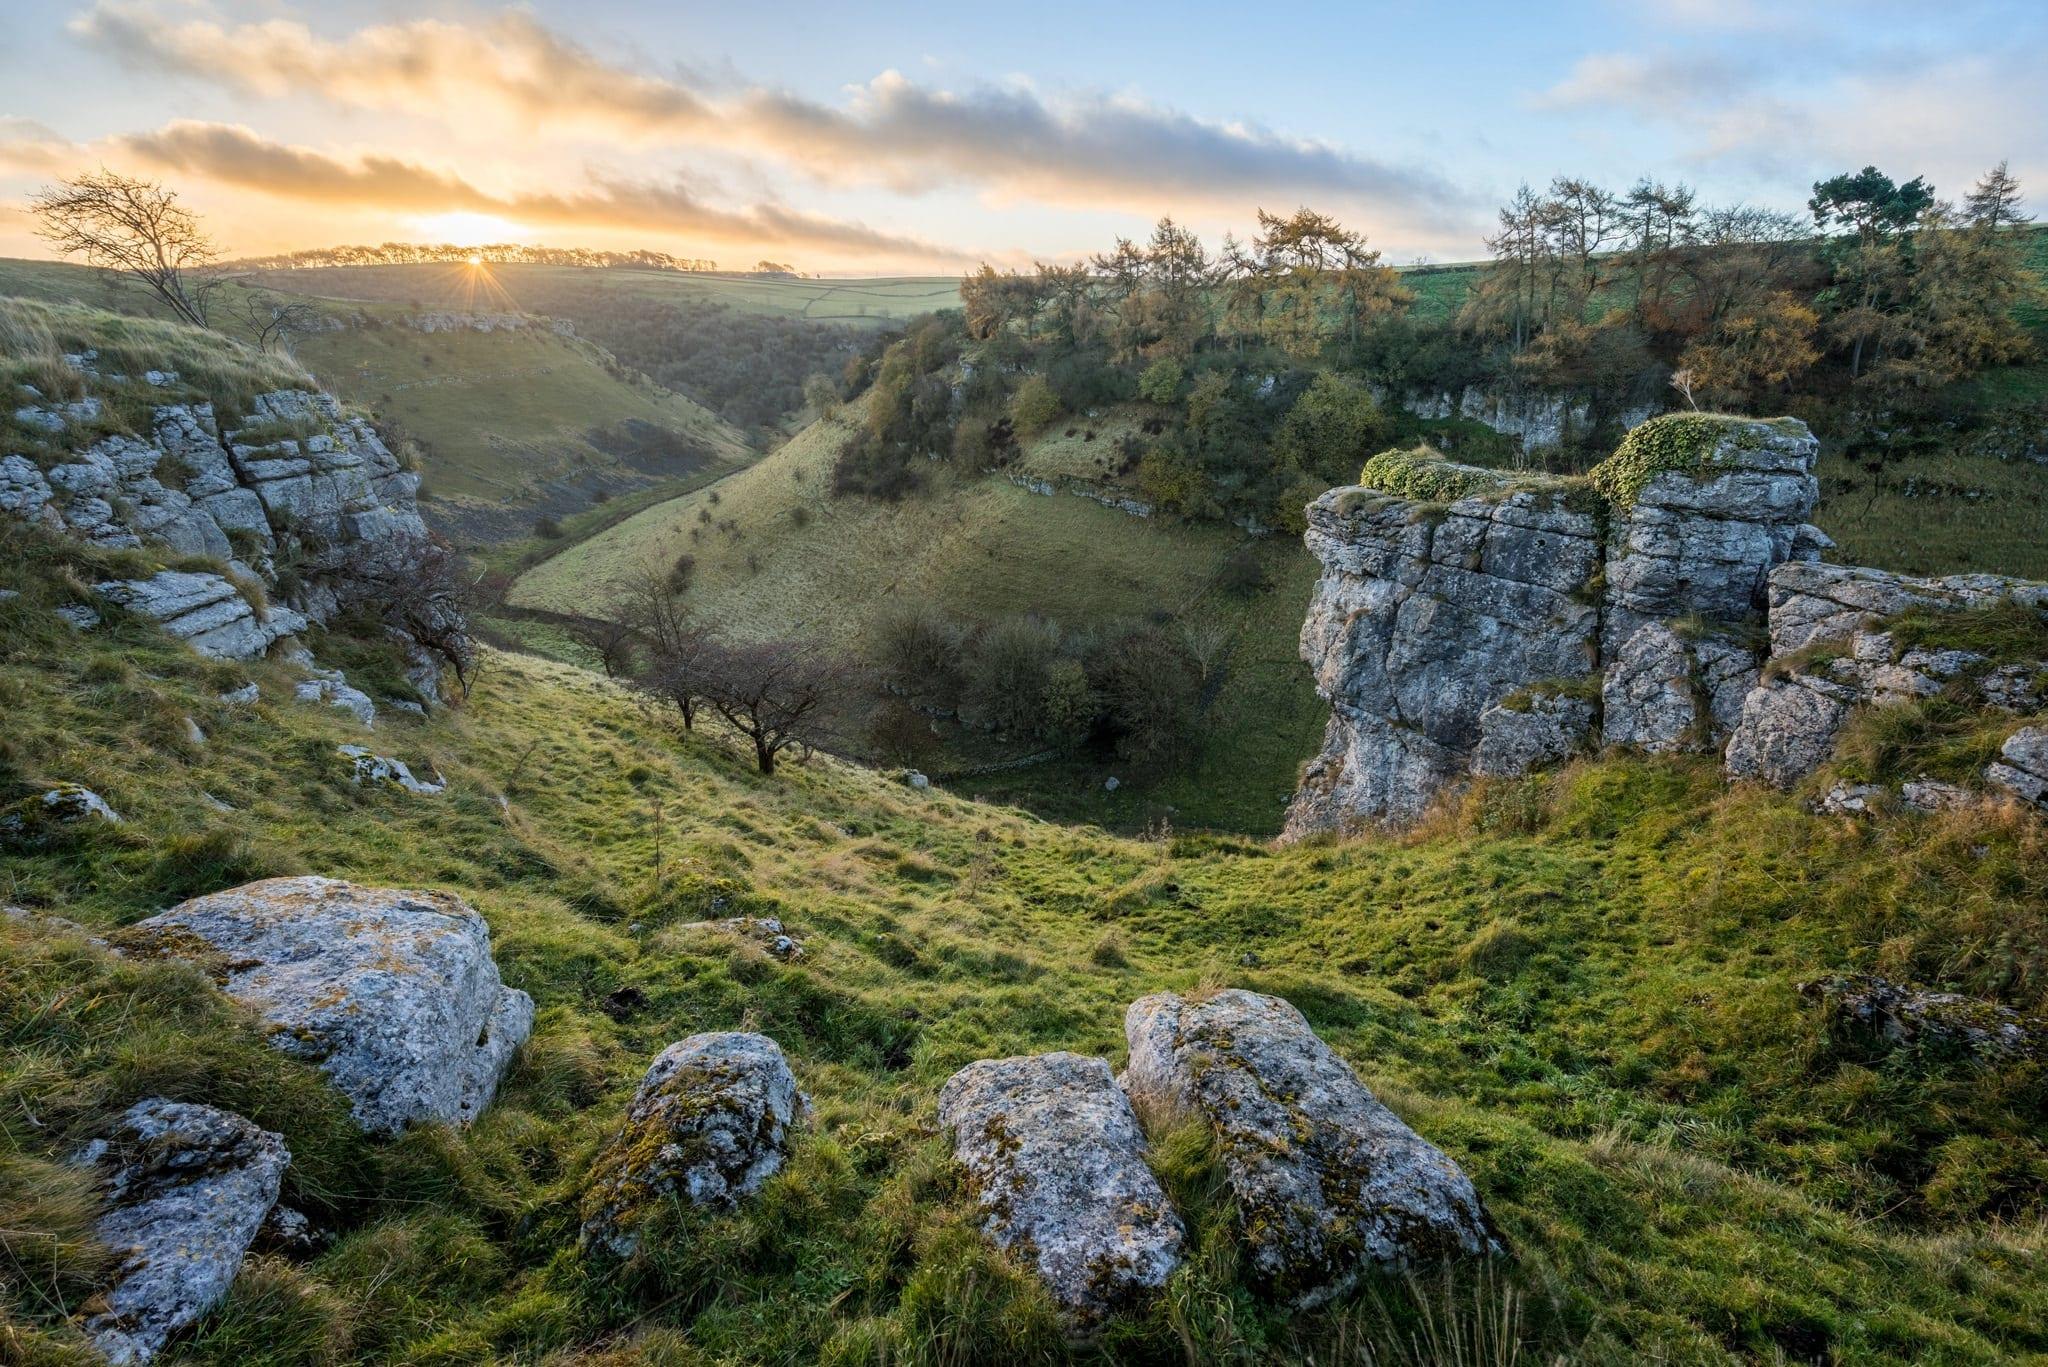 Parson's Tor - Lathkill Dale - South Peak District Limestone Photography Workshop